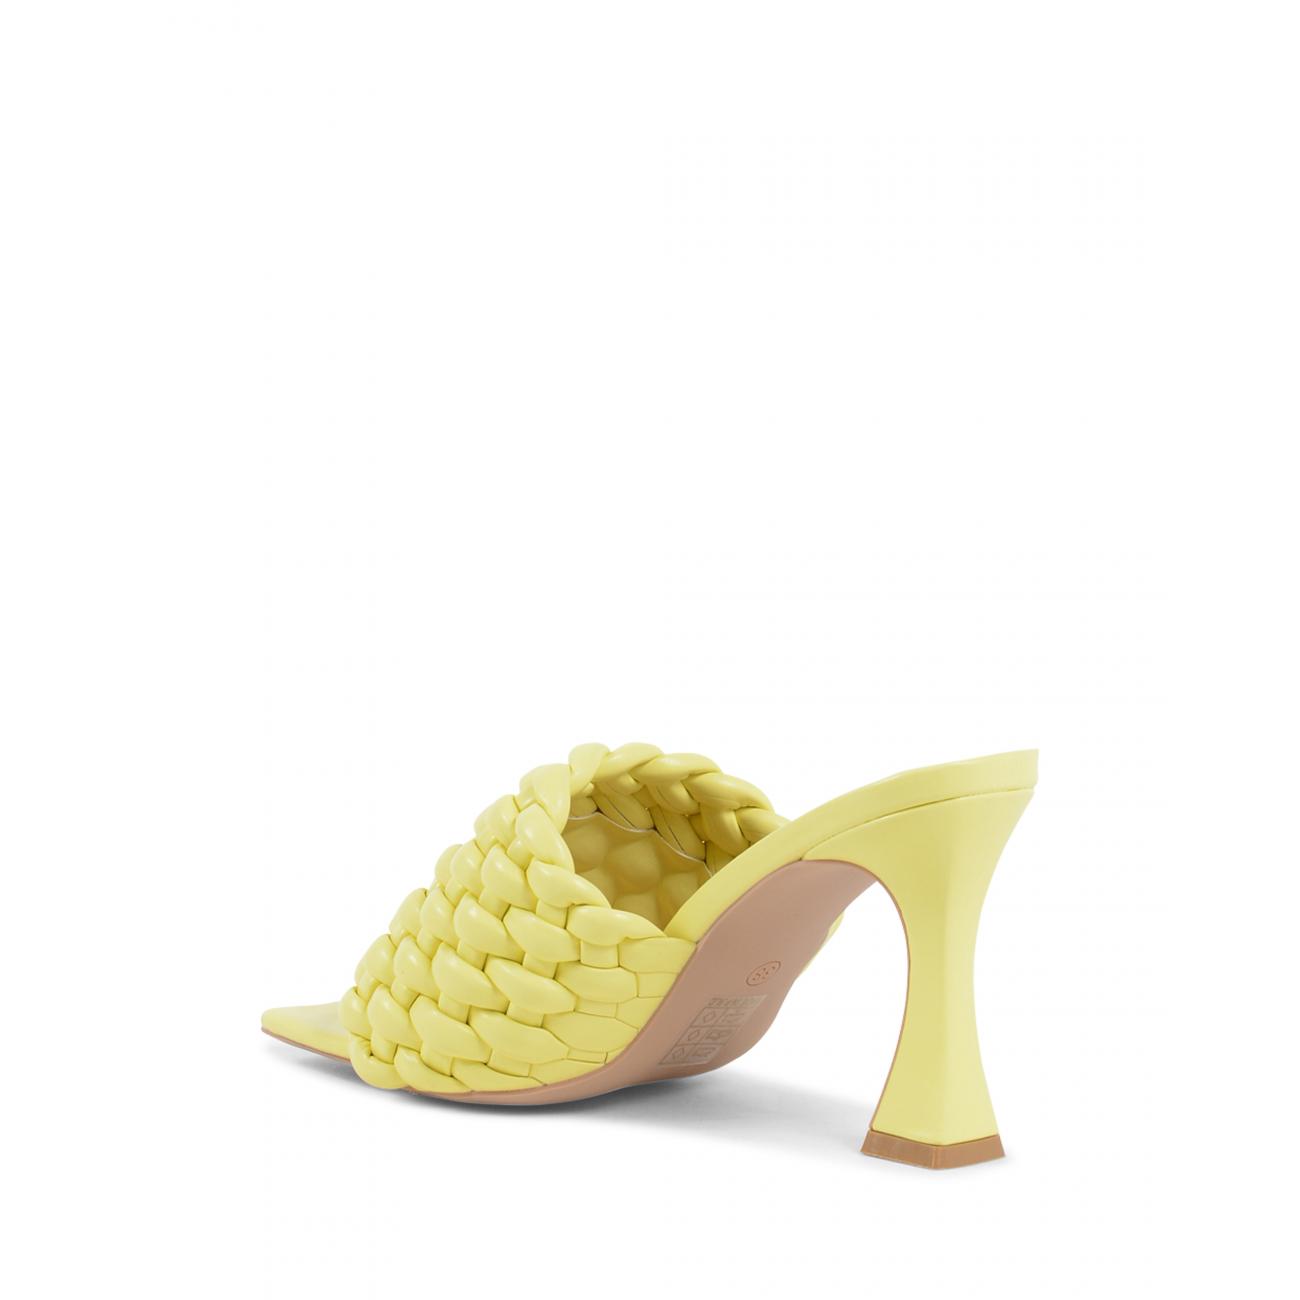 19V69 Italia Women's Mule Sandal Yellow V8185 YELLOW